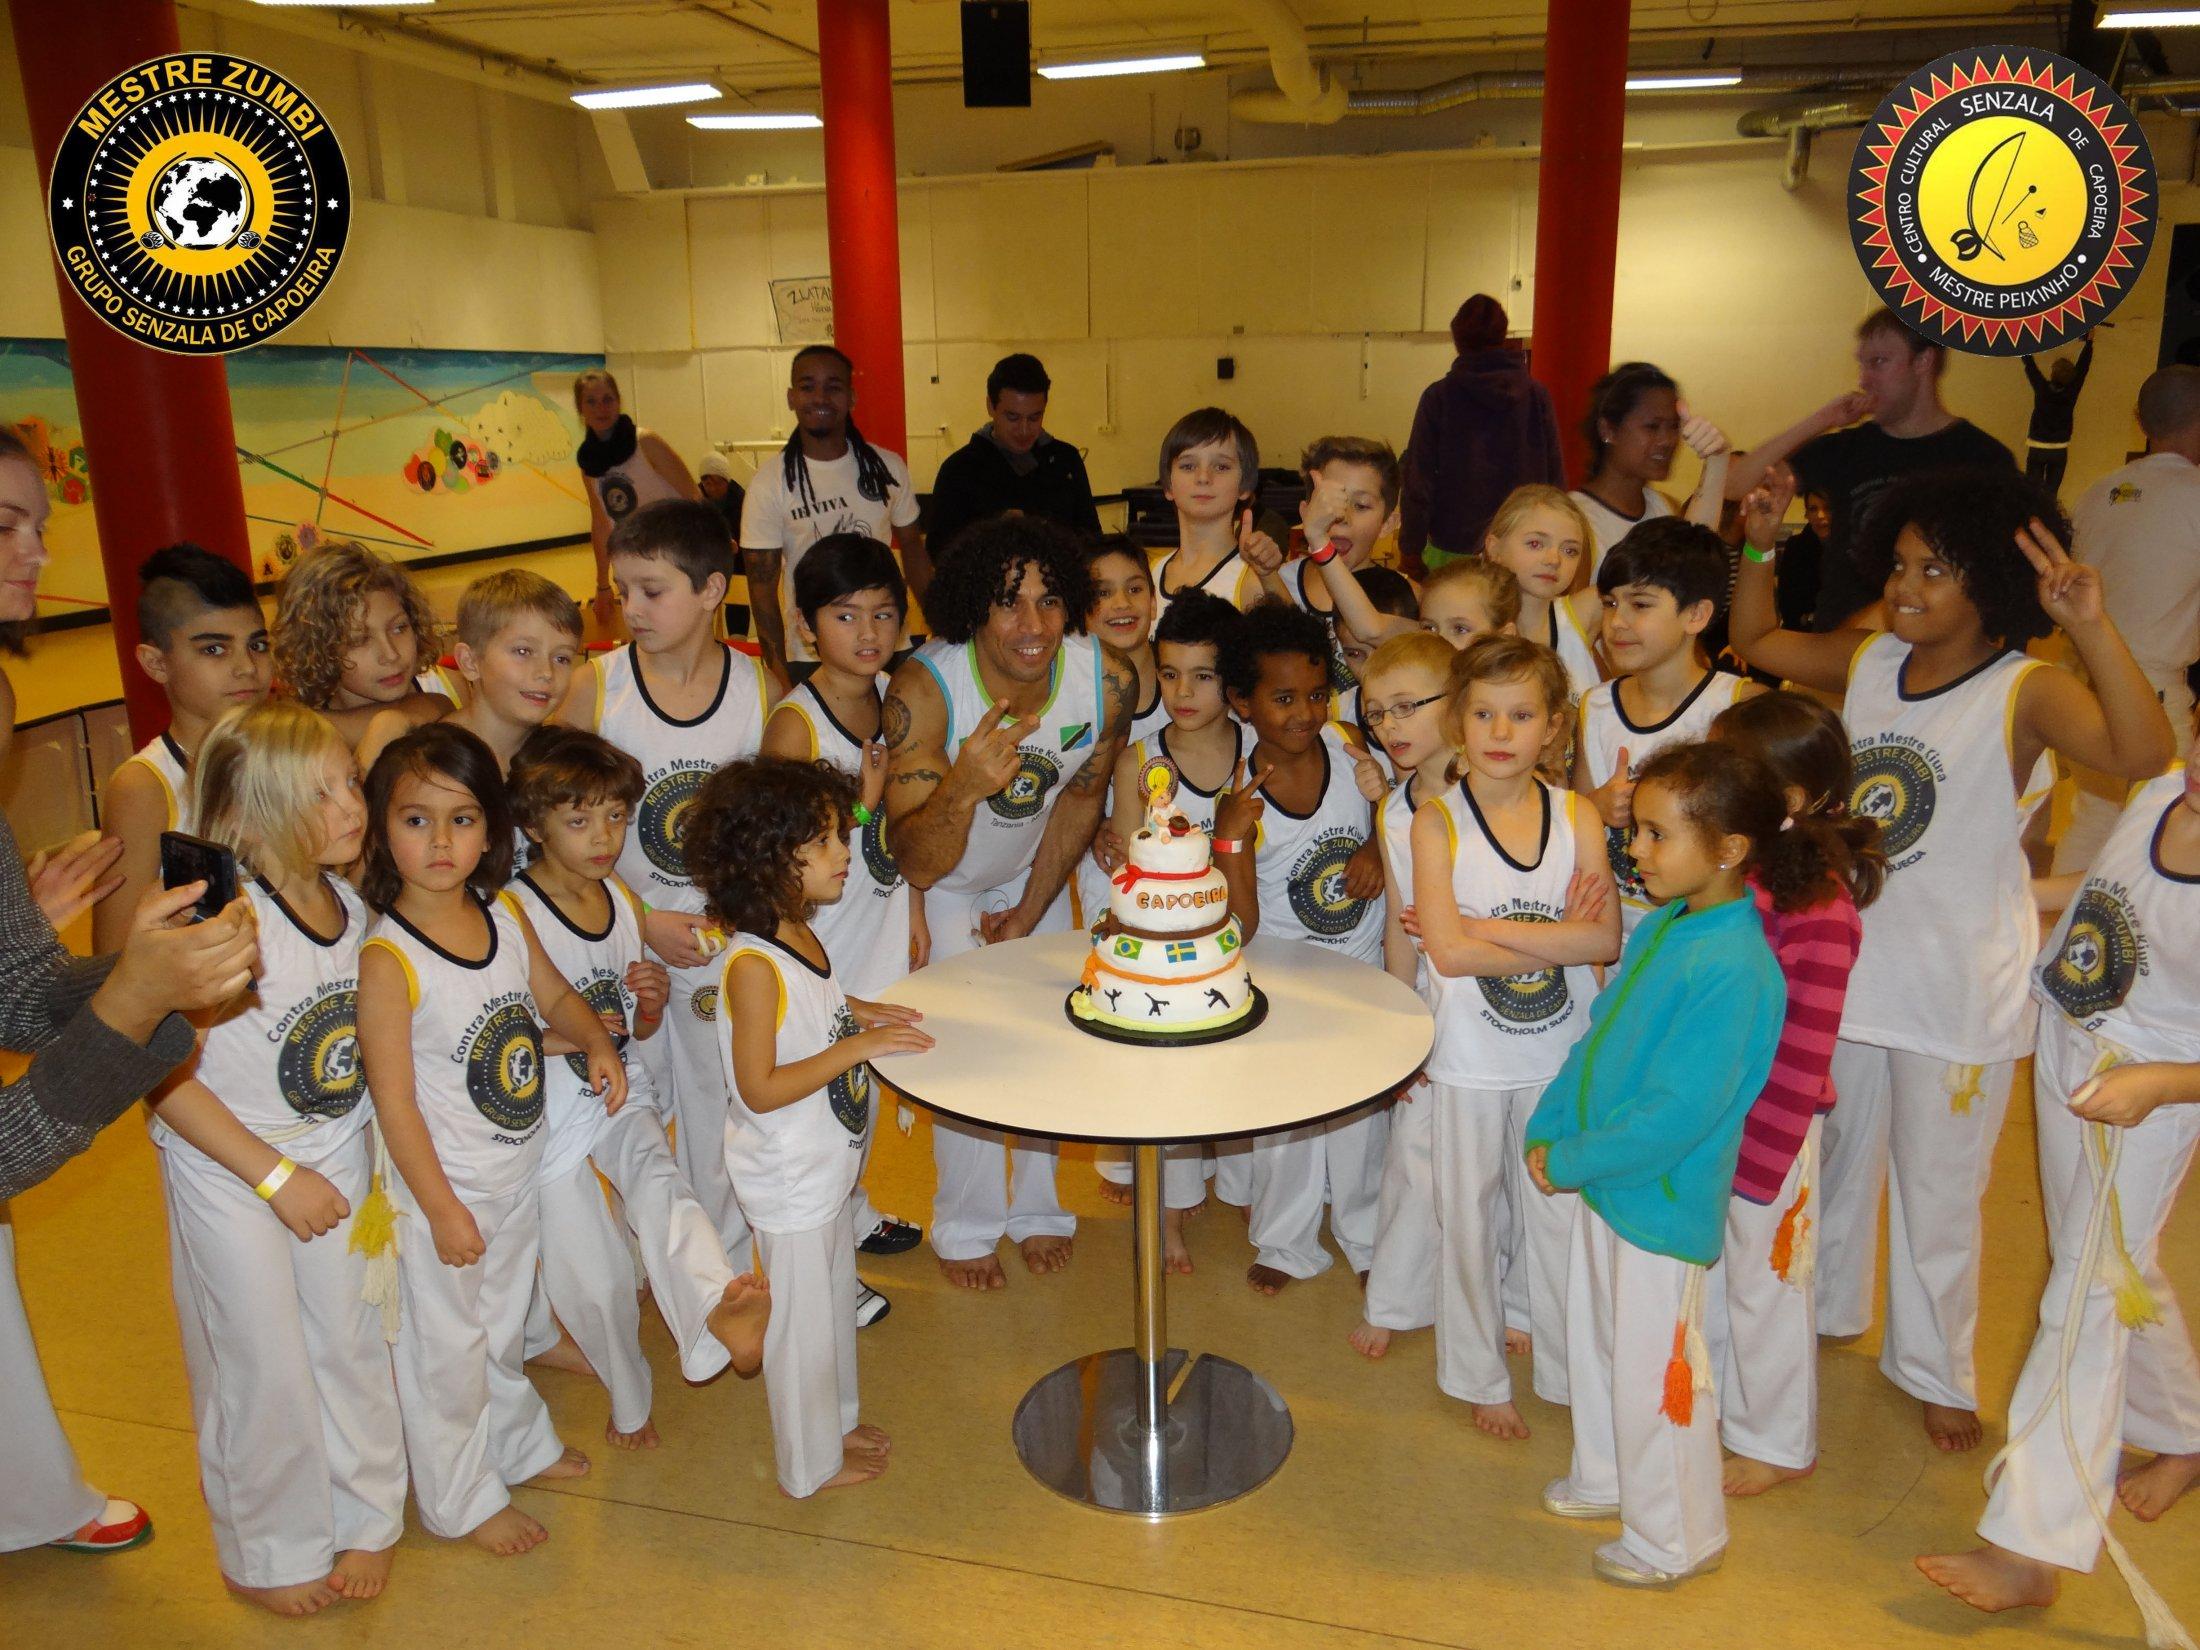 2013-12-14 - Capoeira 116